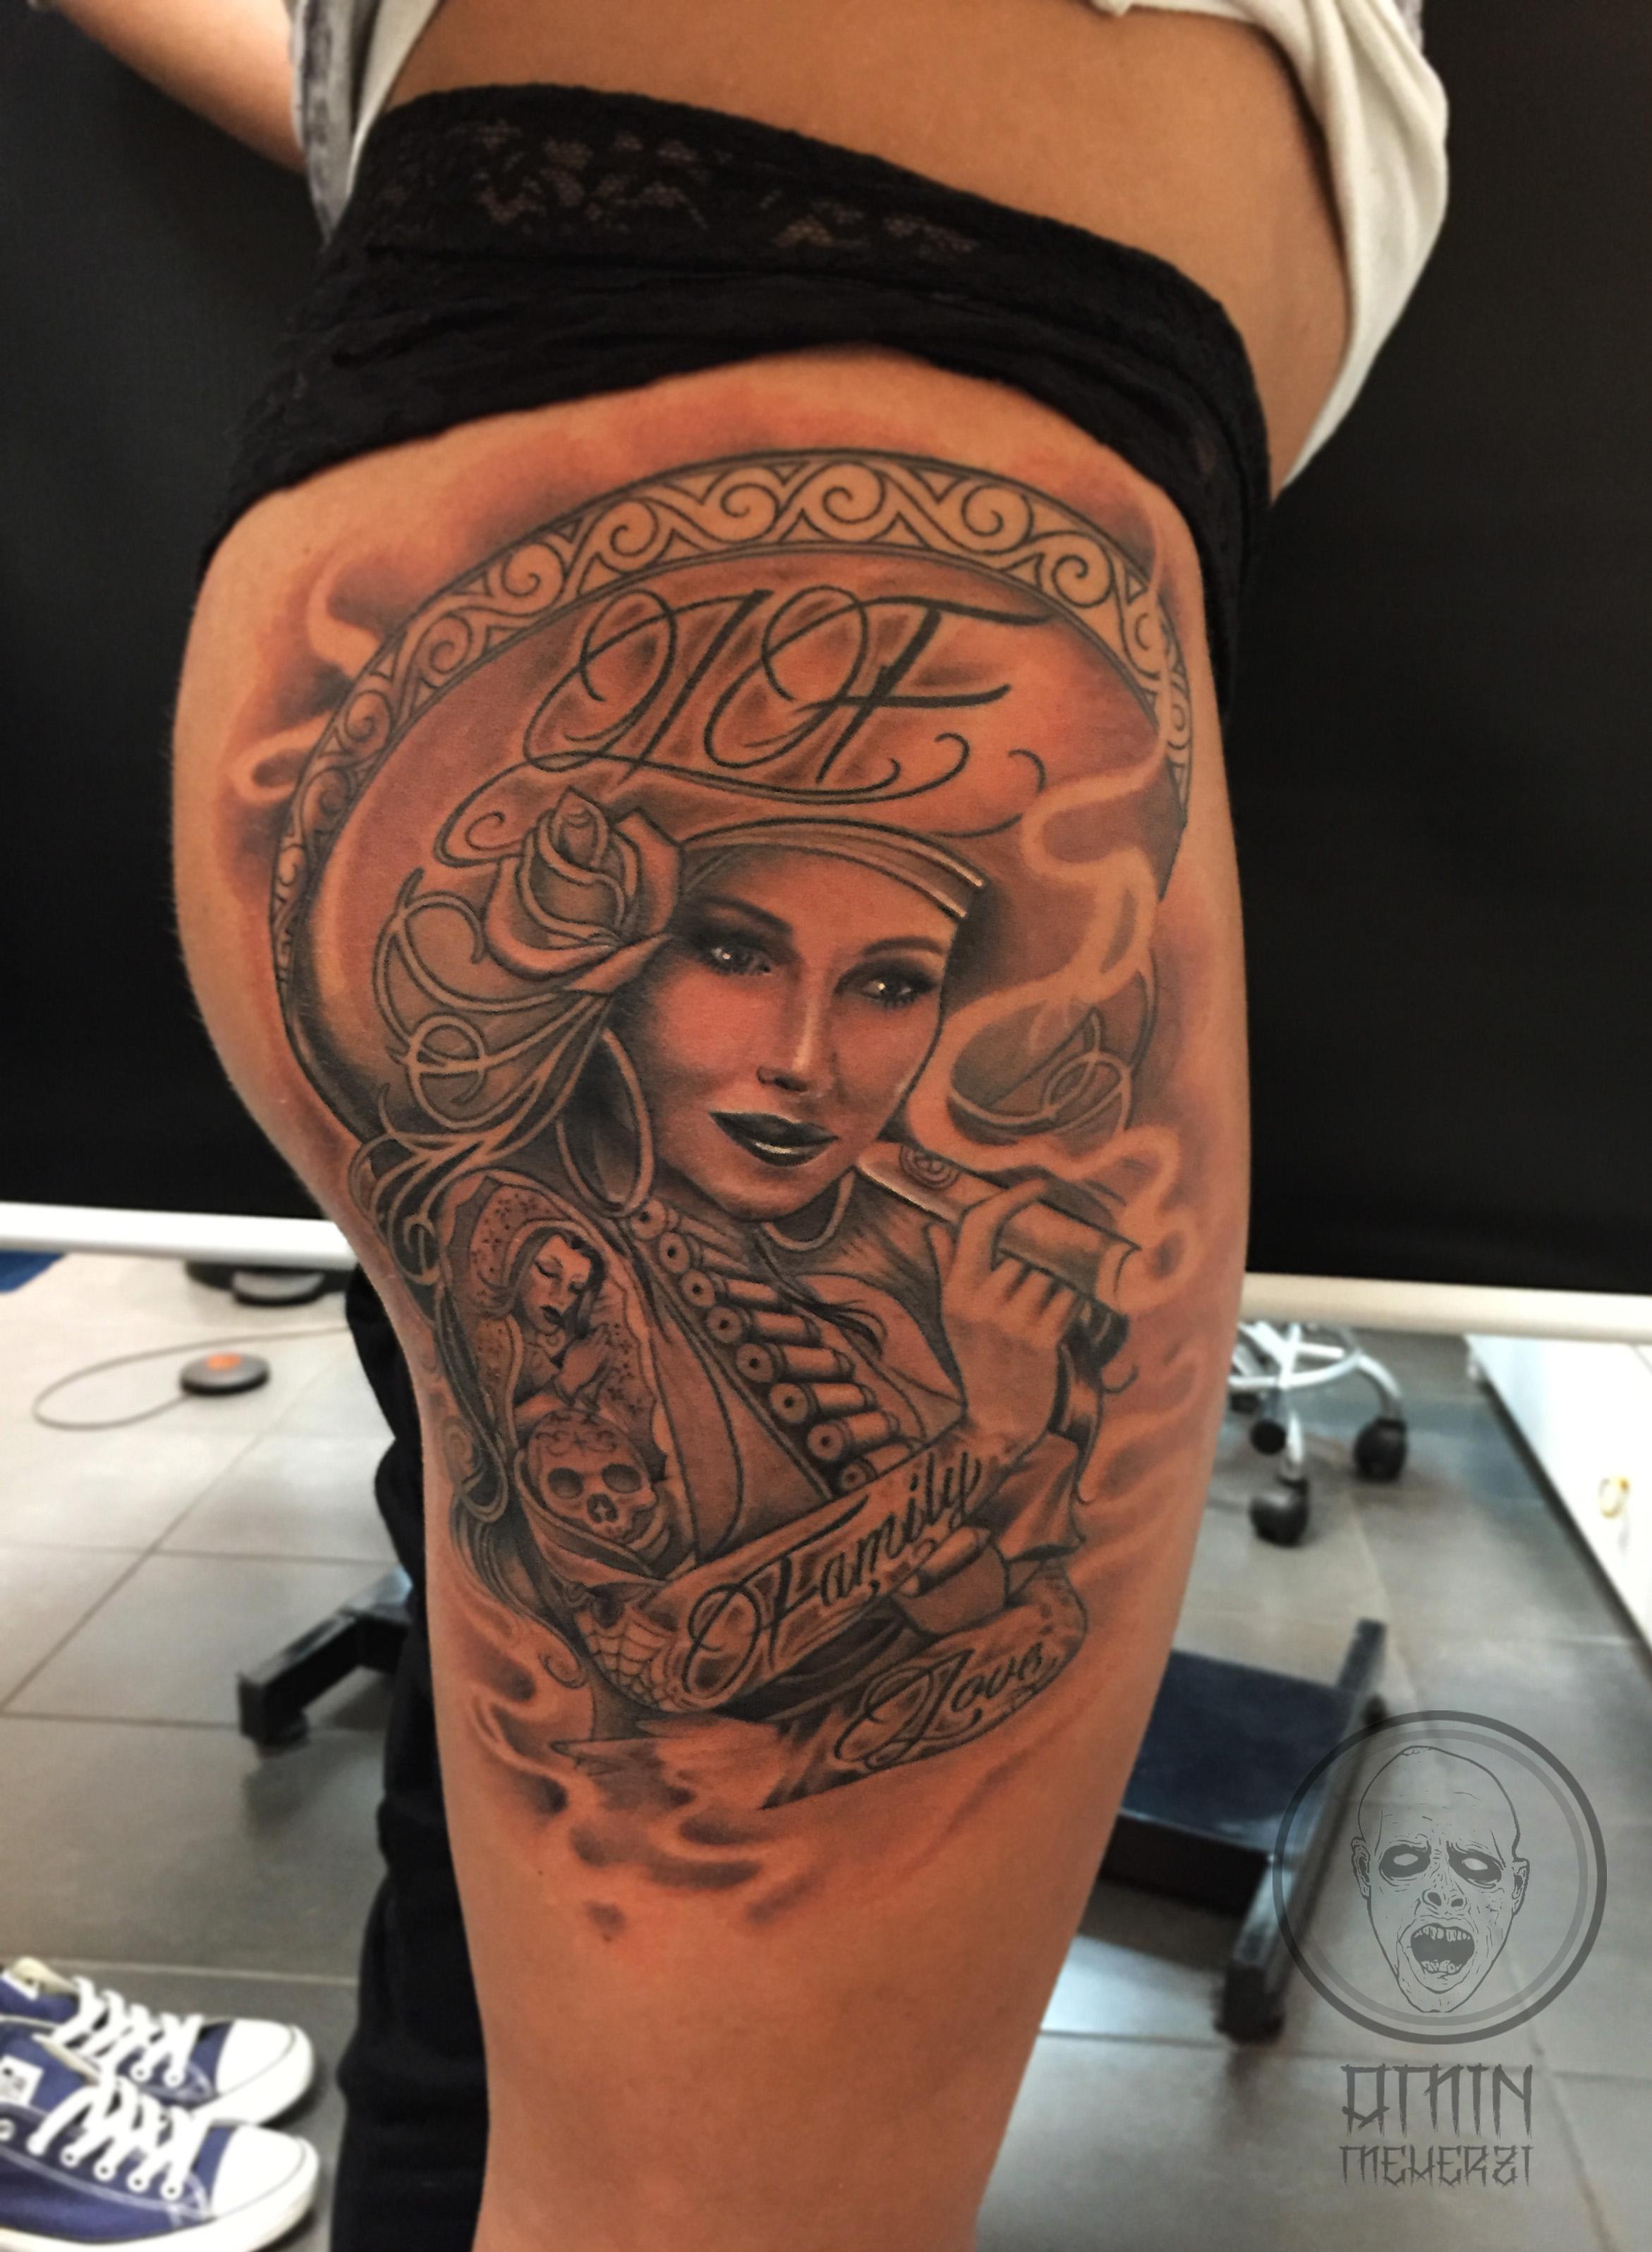 Opus Magnum Tattoo Mexicanwoman   Tattoolife Tattoowork Tattoo Ink Worldofink Inkmaster Tattoogirl Tattooidea Tattoos Tattooworks Viennatattoo Tattoomagazine Tattooconvention Inkwork Realisictattoo Realisticink Tattooshop Blackandgrey Blackandgraytattoo Skin Skinartmag tattoorevuemag supportgoodtattooing sharonalday tattoocommunity tattooedlife tattooed inkedup tattooculture artwork tattooscout tattoodo tattoodobabes myworldofink  tattu tatu opusmagnumtattoo killerink besttattoo besttattooing bestoftattooink tattooing mastertattoo mastertattooing mastertatu mastertattooer tattooer besttattooever bestinktattoo besttattooartist  tattooartist reasliticartist realistictattooartist tattooingartist  inkartist awsometattoo awsomtattooartist awsomtattooartists awsomtattooing awsomink awsomtattoorealistic awsomtattoohyperrealistic nicetattoo nicetattooart nicetattoowork nicetattooink nicetattooart famoustattoo famoustattooart famousartwork famostattooartist goodtattooing goodtattoos goodtattoorealistic tattooconvention inportainttattoo importainttattooart importainttattoowork importaintartist importantrealistictattoo importainttattooing tattoogun amintattoo aminart aminmeherzitattoo amintattooartist amin aminartist meherzitattoo aminmeherzi 1150wien schweglerstaße skintattoo tattoooftheday tattoooftheweek tattooofthejear tattooprice tattooinfinity tattoos tattooblack tattooapointment tattooaustria usatattoo lining liningtattoo insta instagram facebook fb projecttattoo project love fun progressing progress artofopusmagnum artofopus artofmagnum sullen sullentattoo sullenart sullenink worldfamousink killerinktattoo killerink killerinkamin shading shadingtattoo  sullen sullenfamily girlswithtattoo boyswithtattoo inkedman inkedboy inkedgirl design style tattoostyle lovemyjob lovetattoos wowtattoo realism realismtattoo realismtattooart silverbackink silverbacktattoo silverback tattooartgallarie gallerie galleri pritty prittytattoo prittytattooidea prittytattooing freshlyink freshl